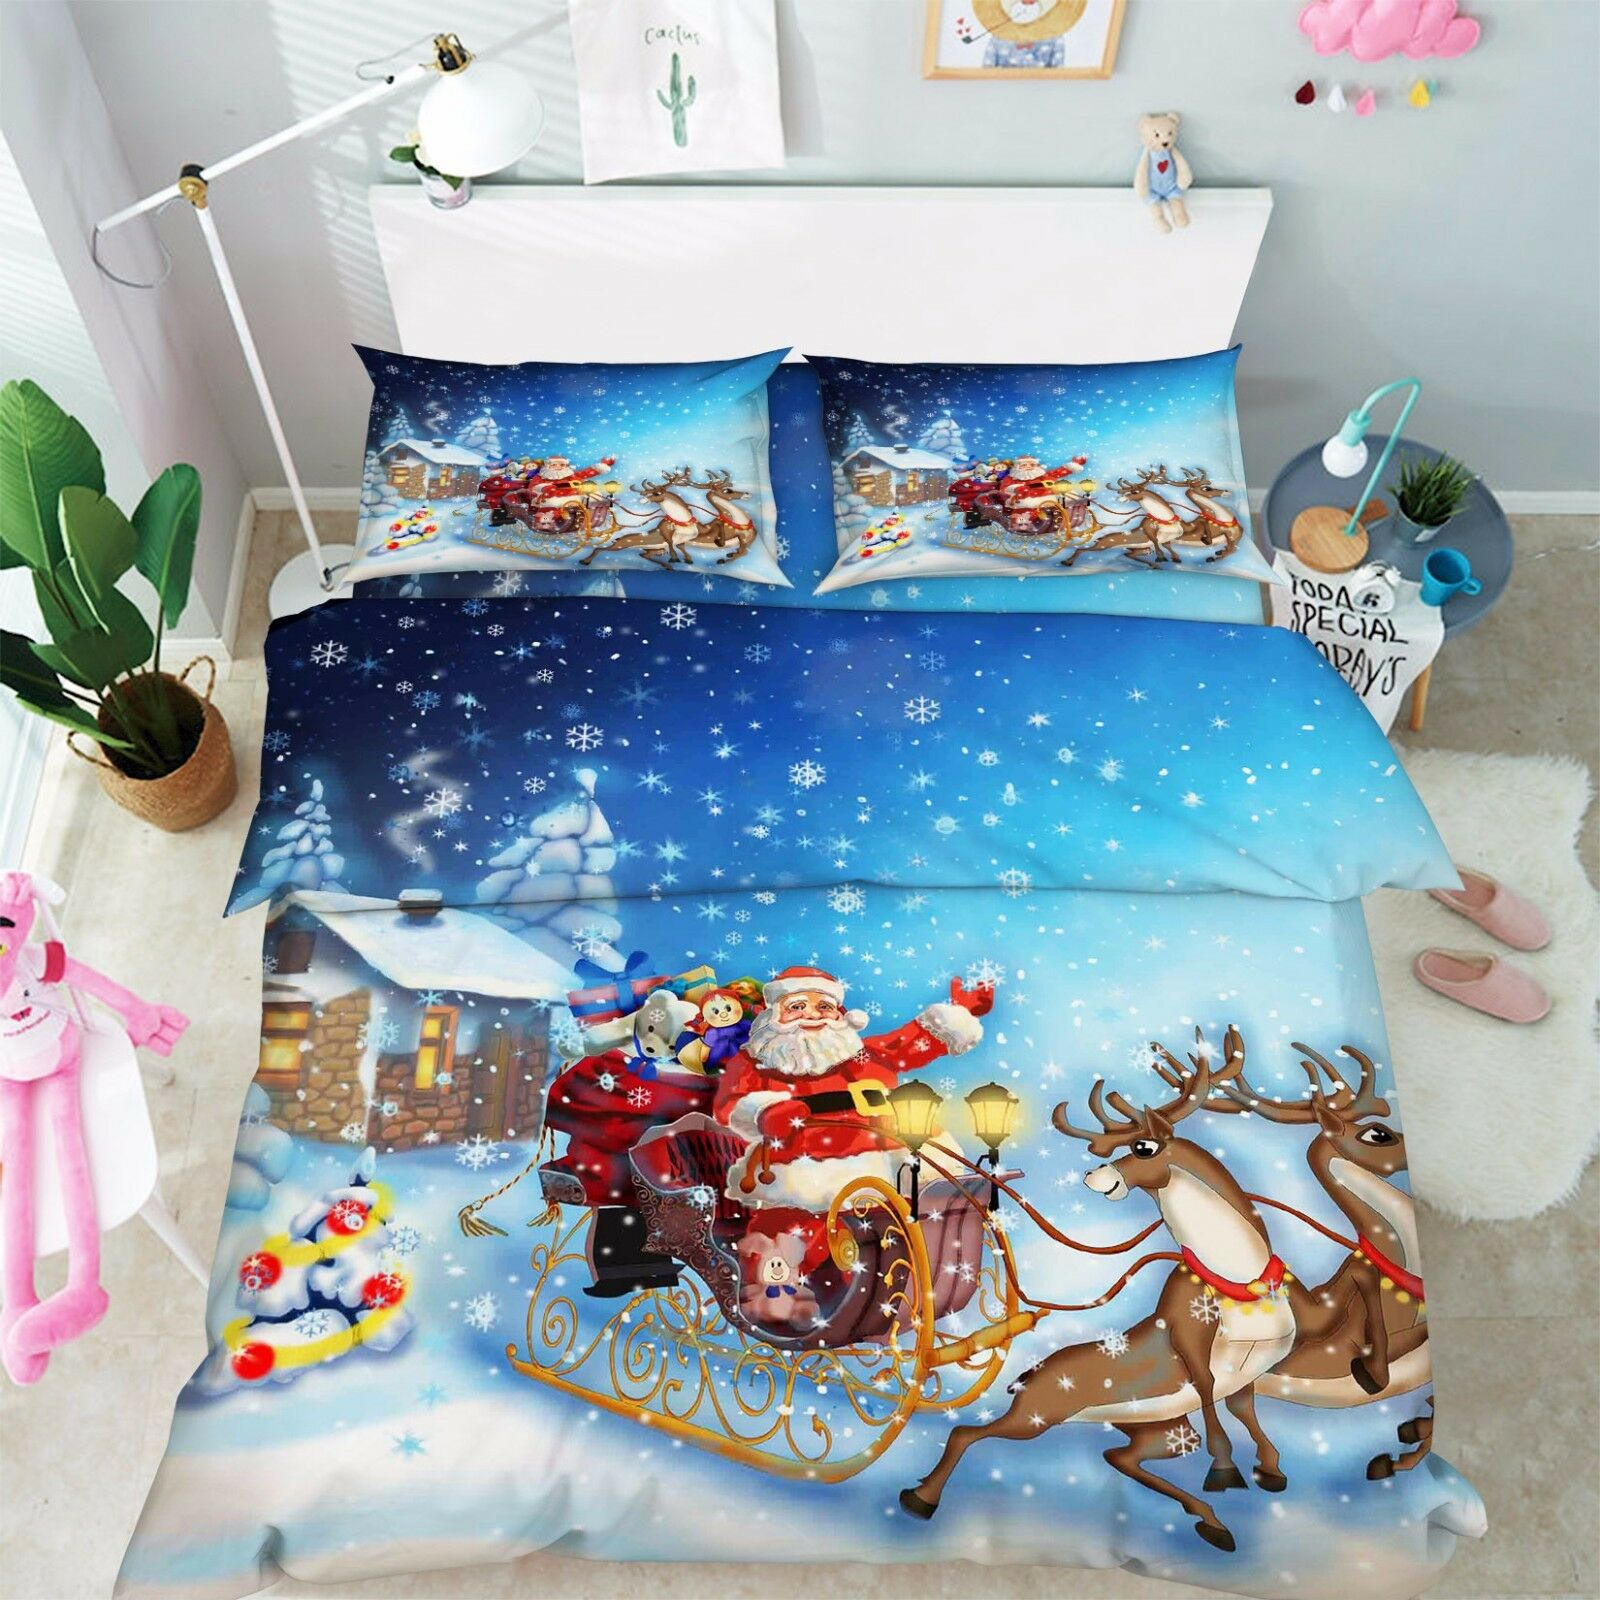 3D Xmas Snowing 806 Bed Pillowcases Quilt Duvet Cover Set Single Queen UK Kyra